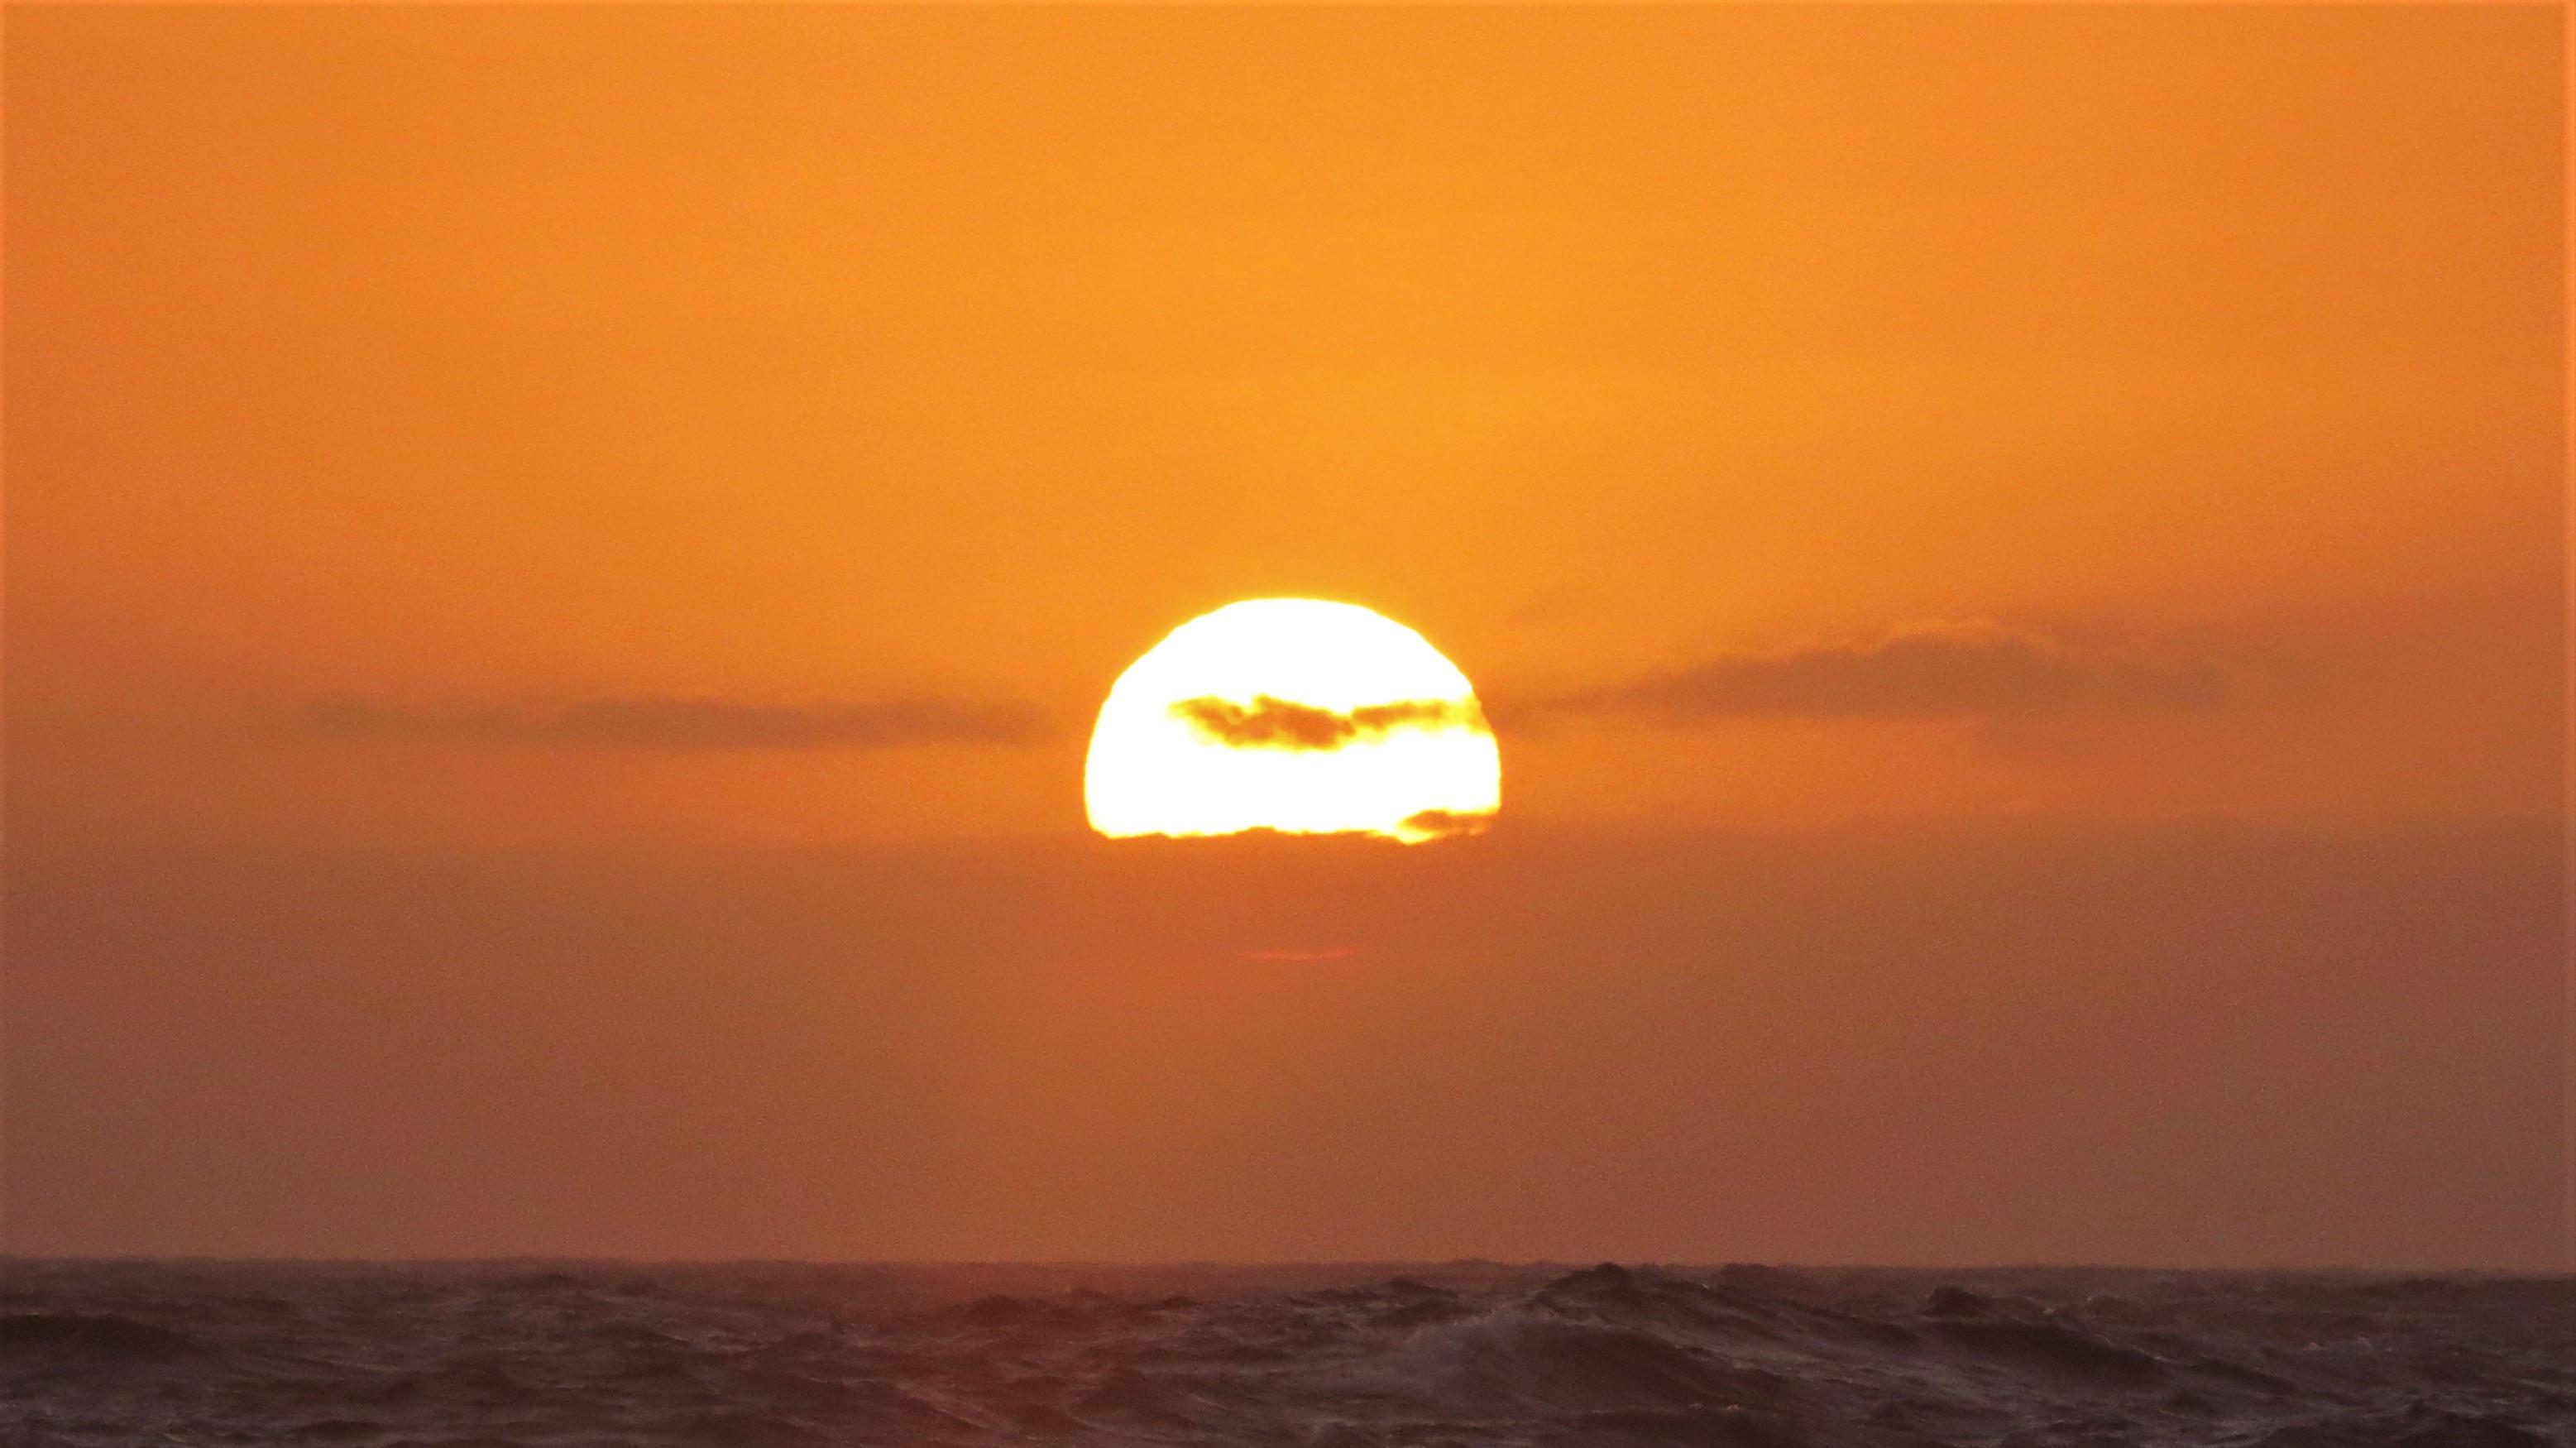 Romantic Sunset 2 pers *price pp